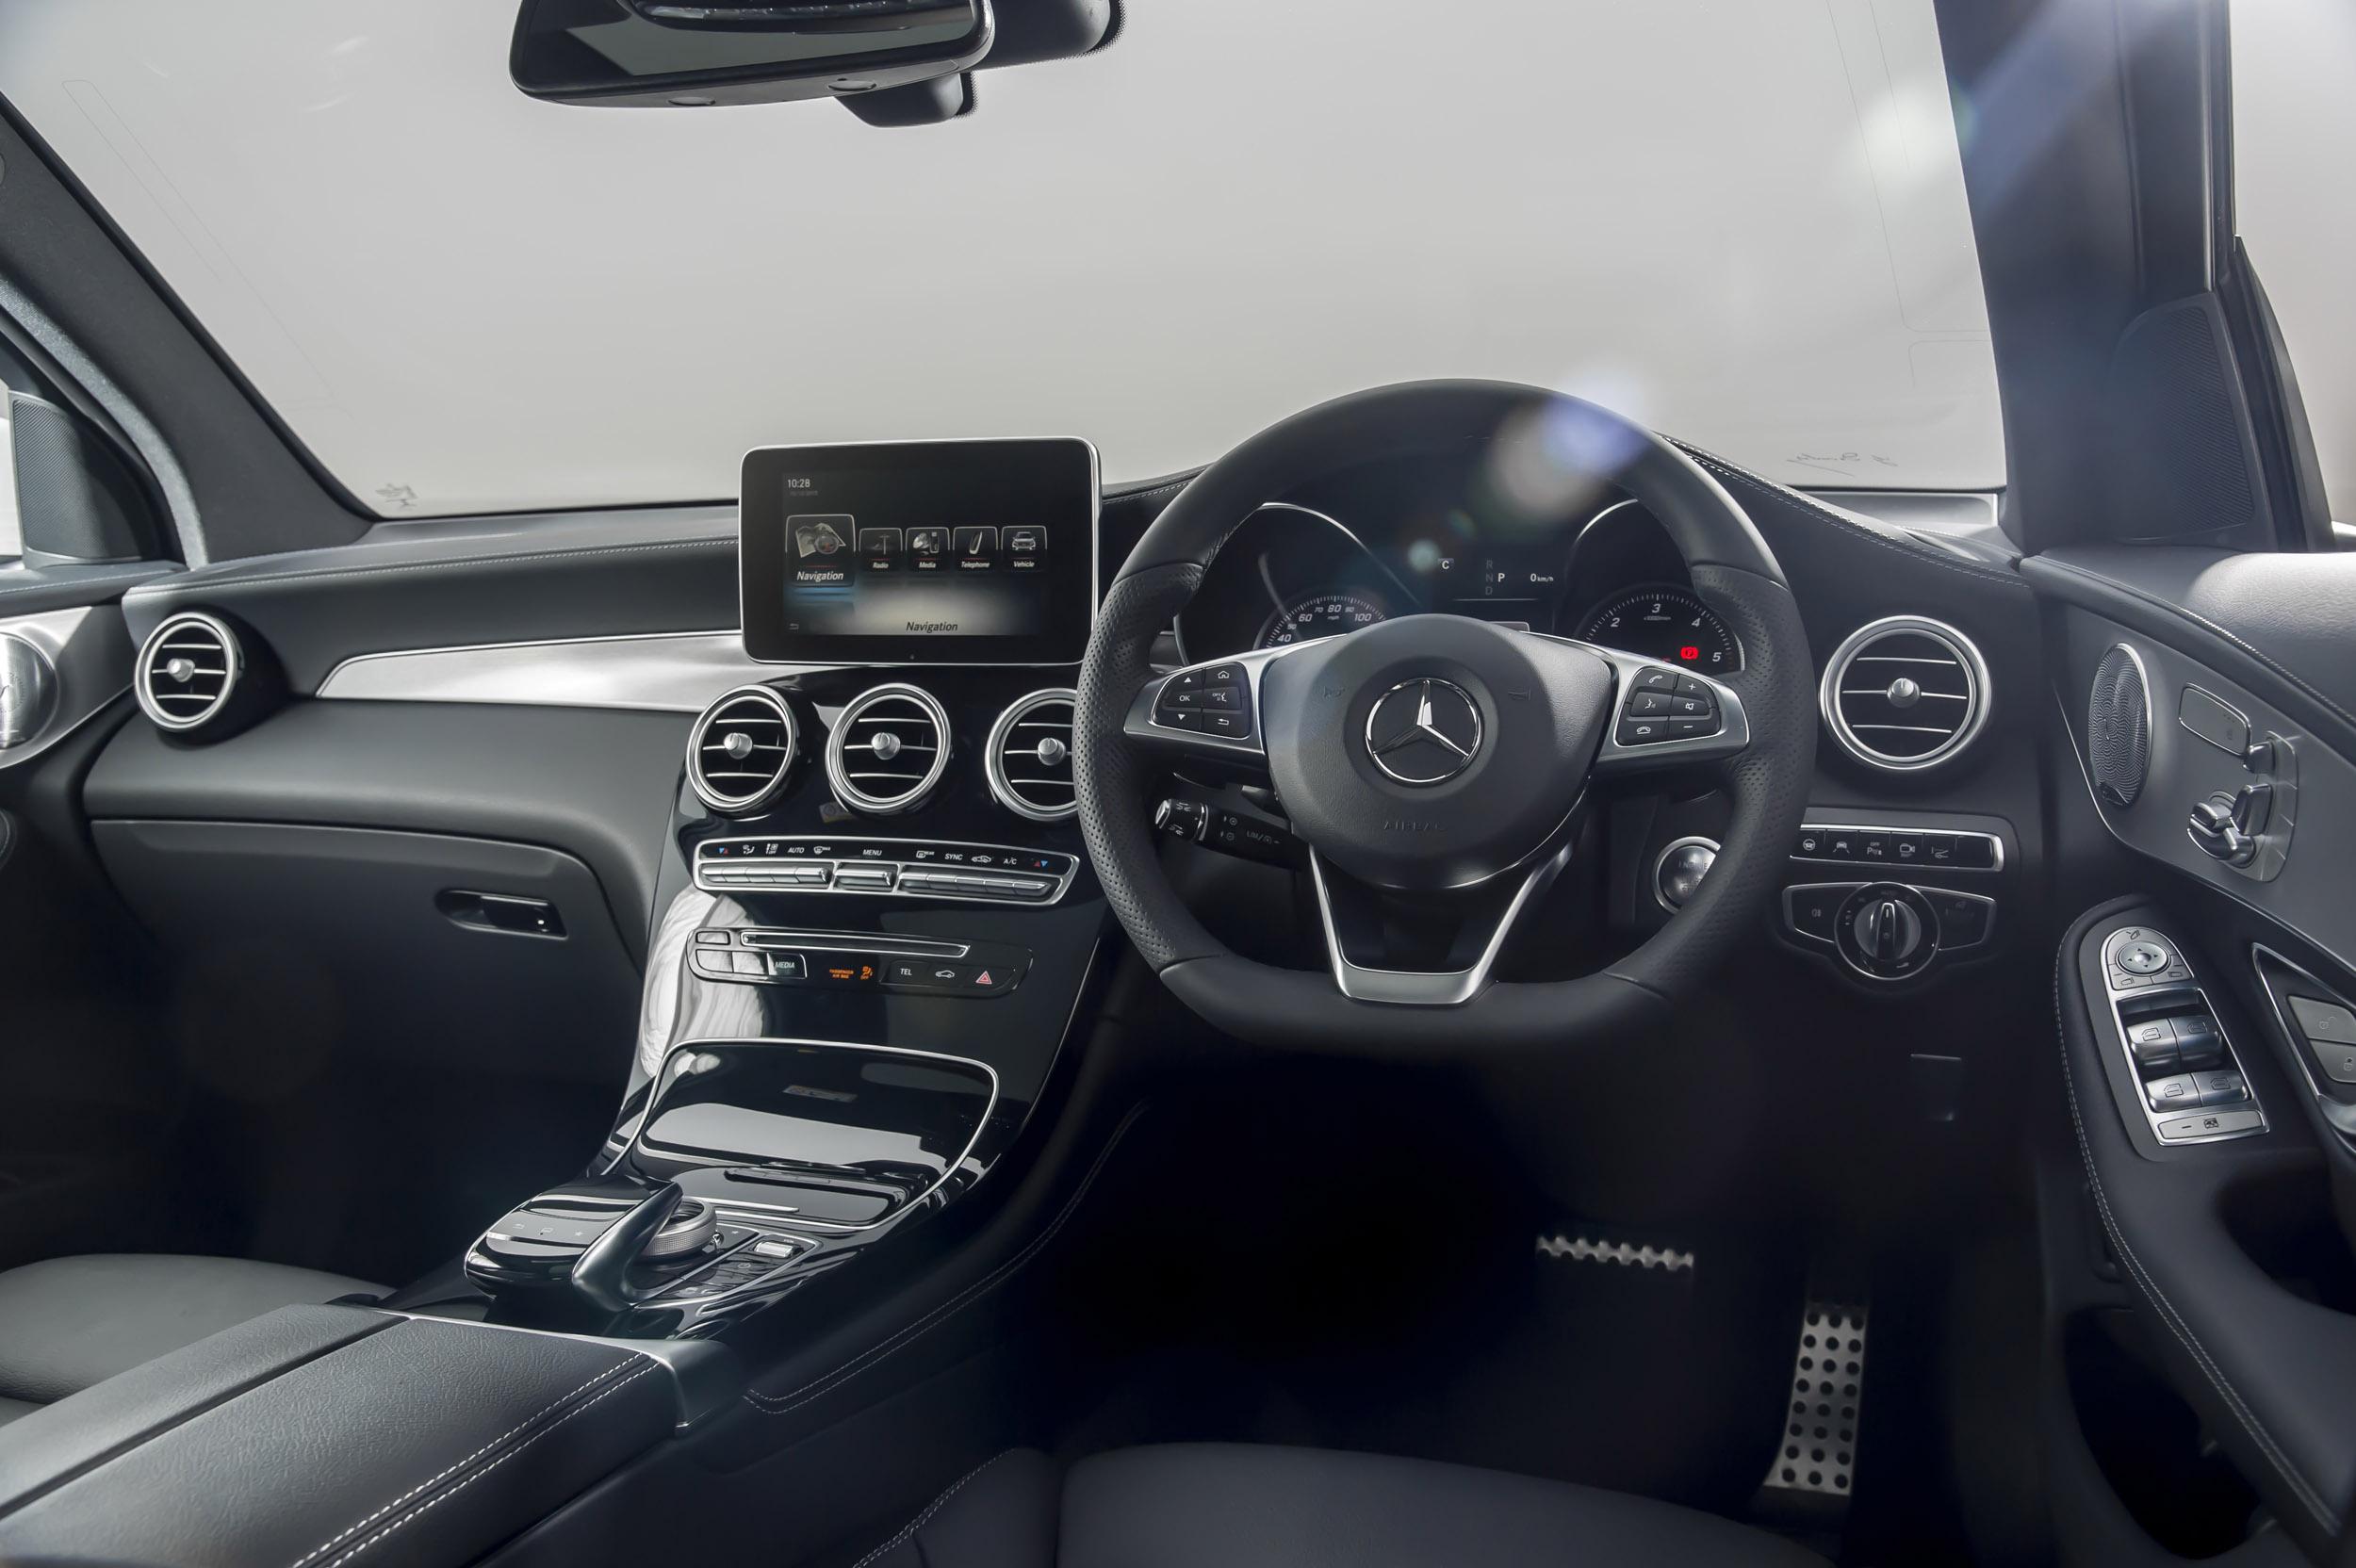 Mercedes-Benz GLC - A SUV for keen drivers? | Evo